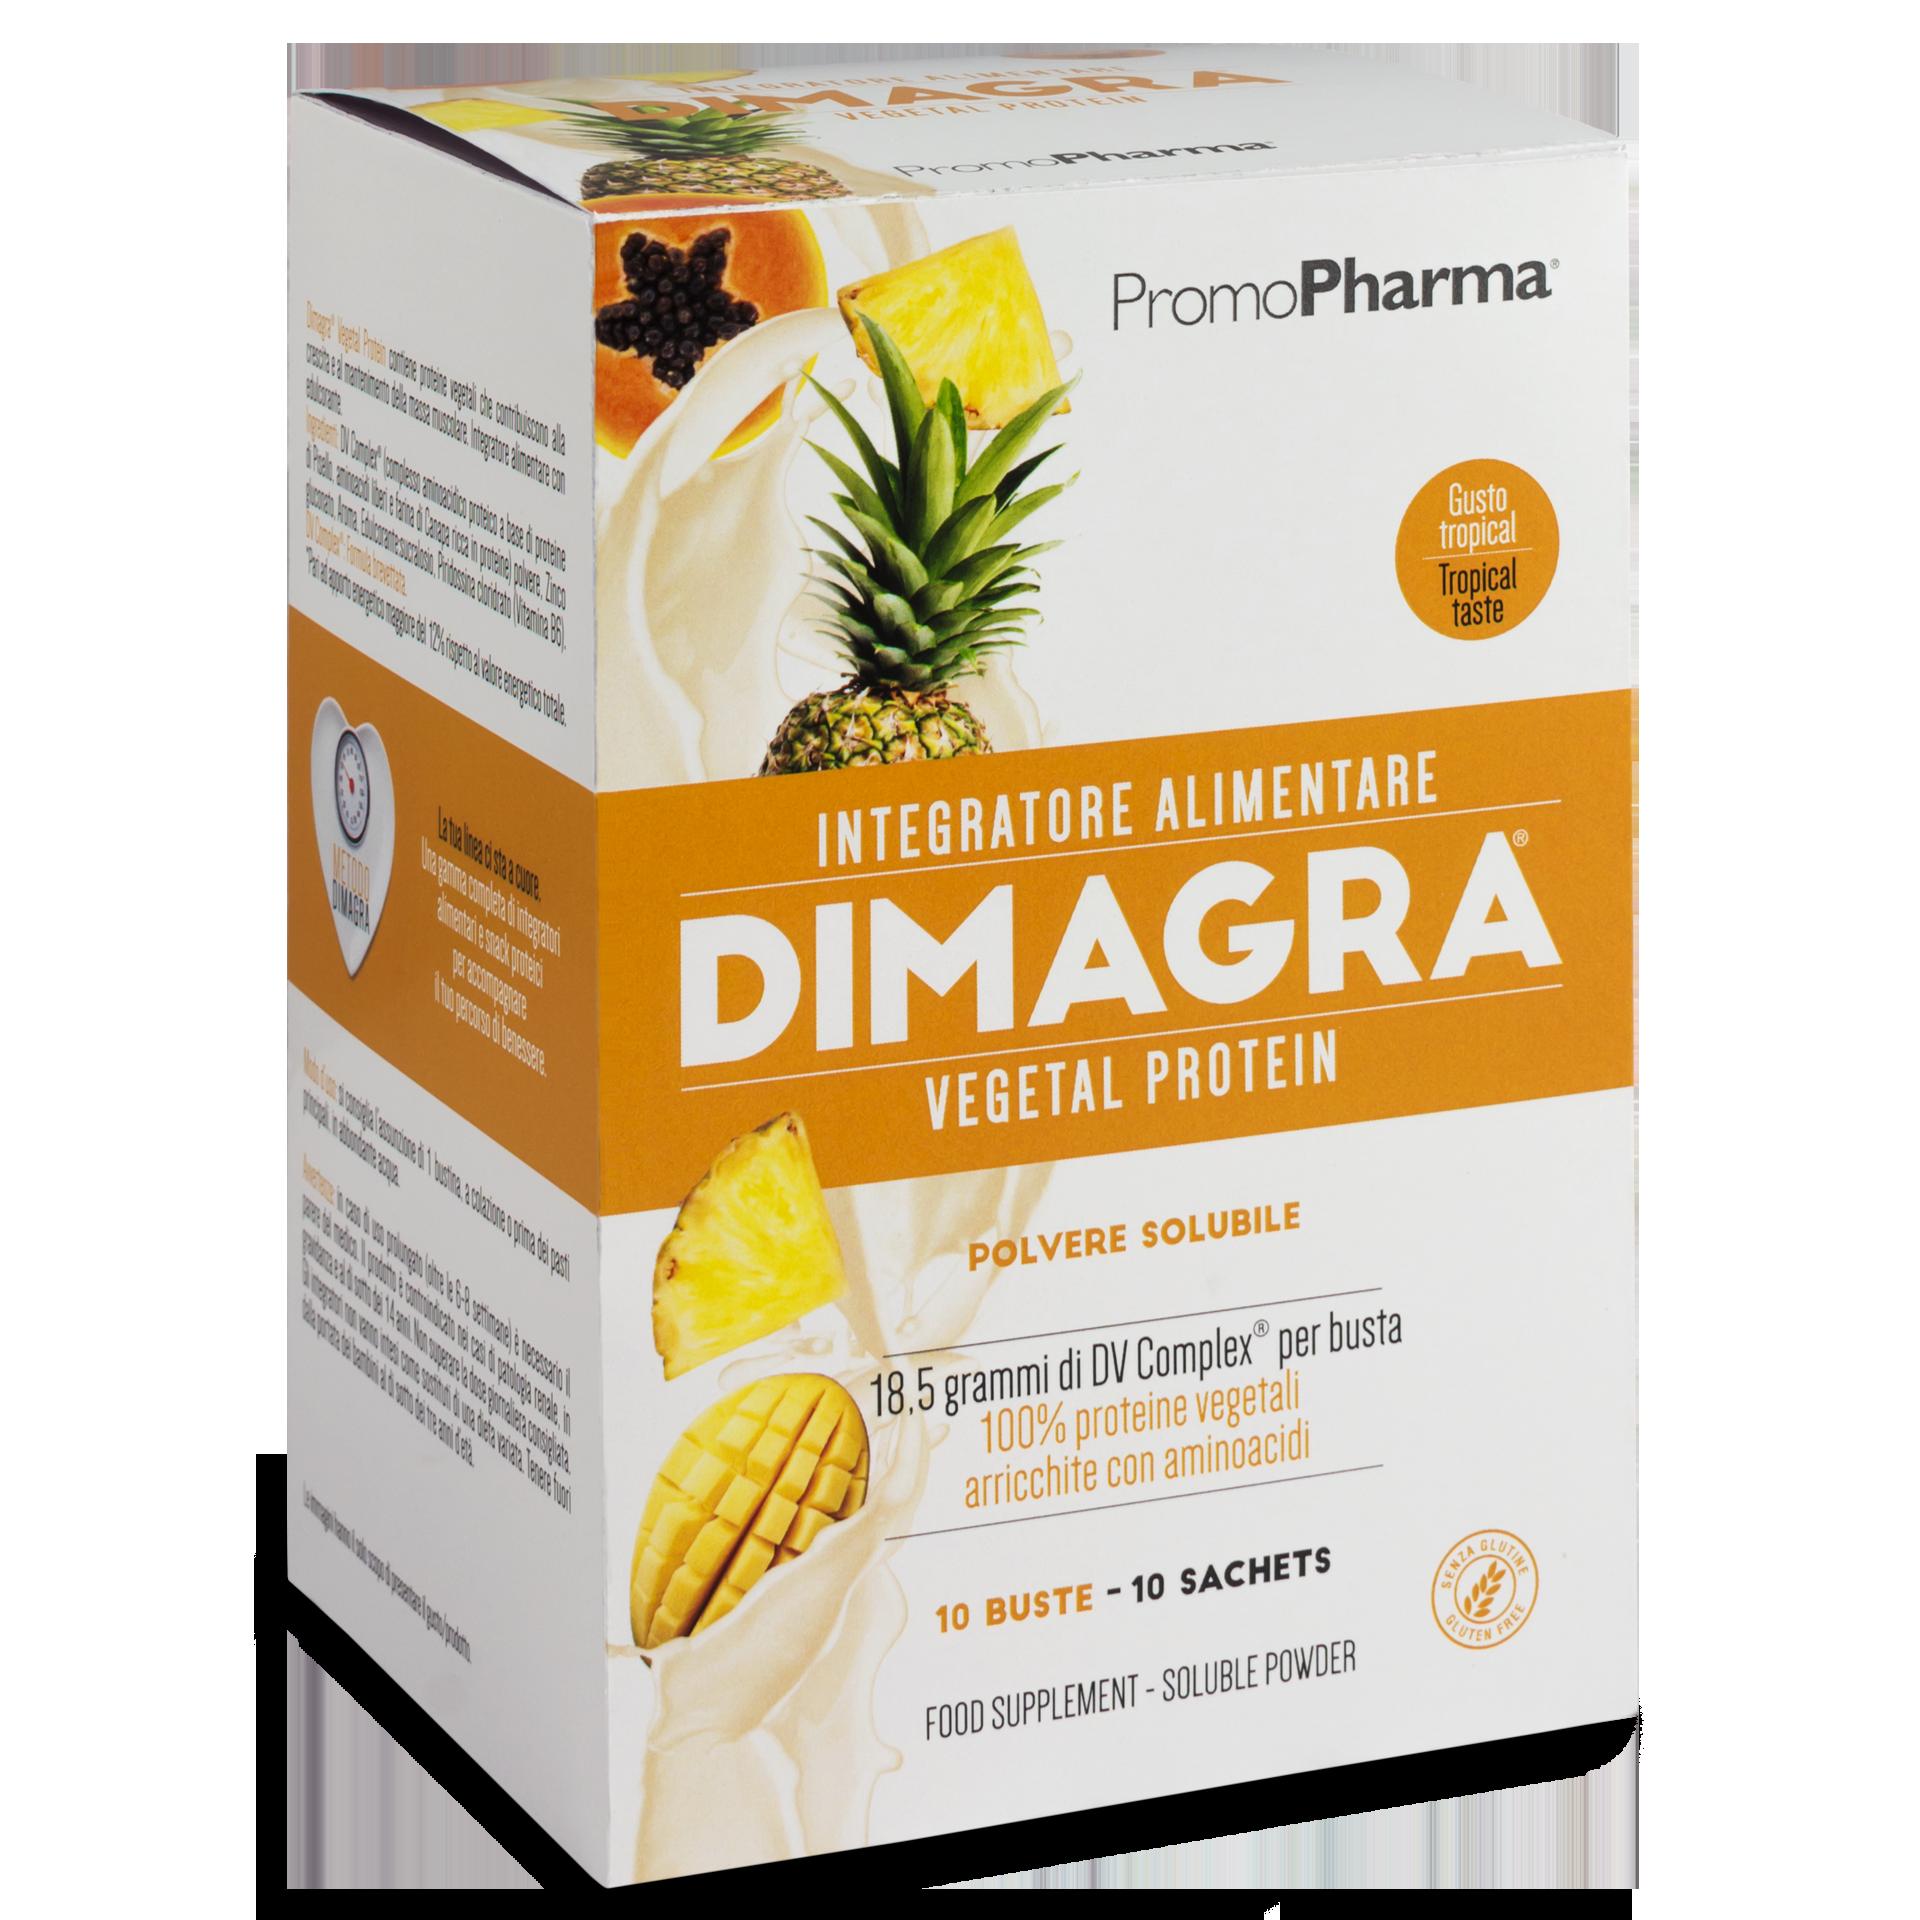 Dimagra® vegetal protein